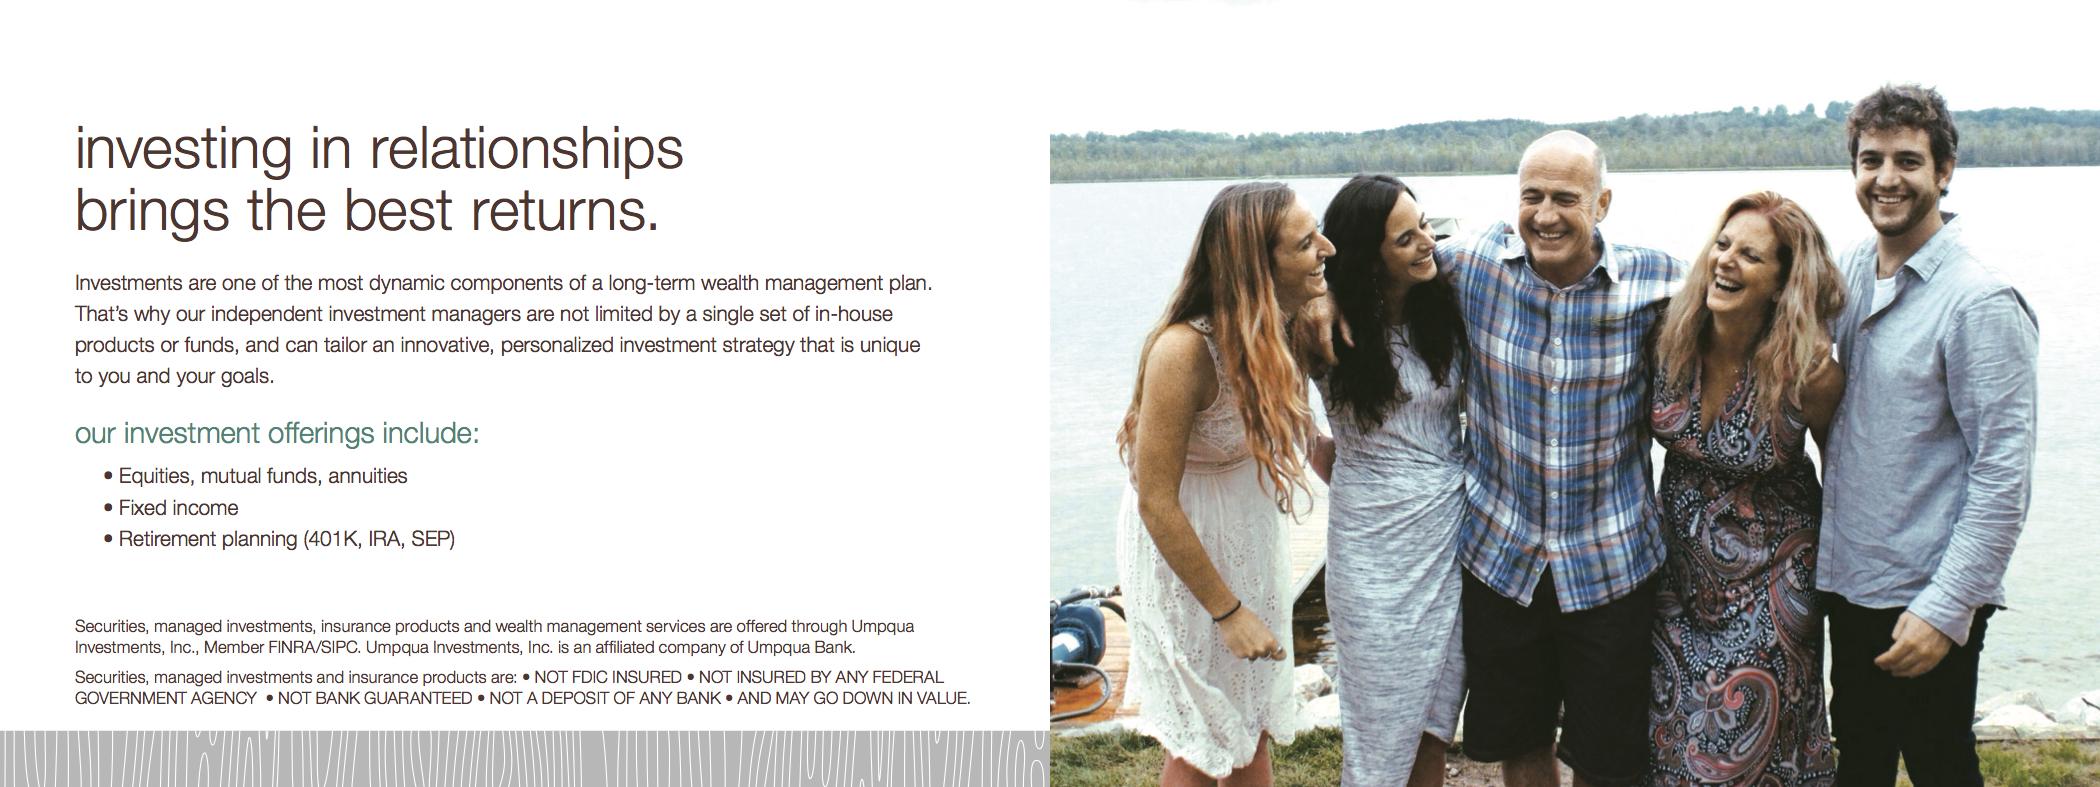 Umpqua Private Banking (Booklet)d.jpg